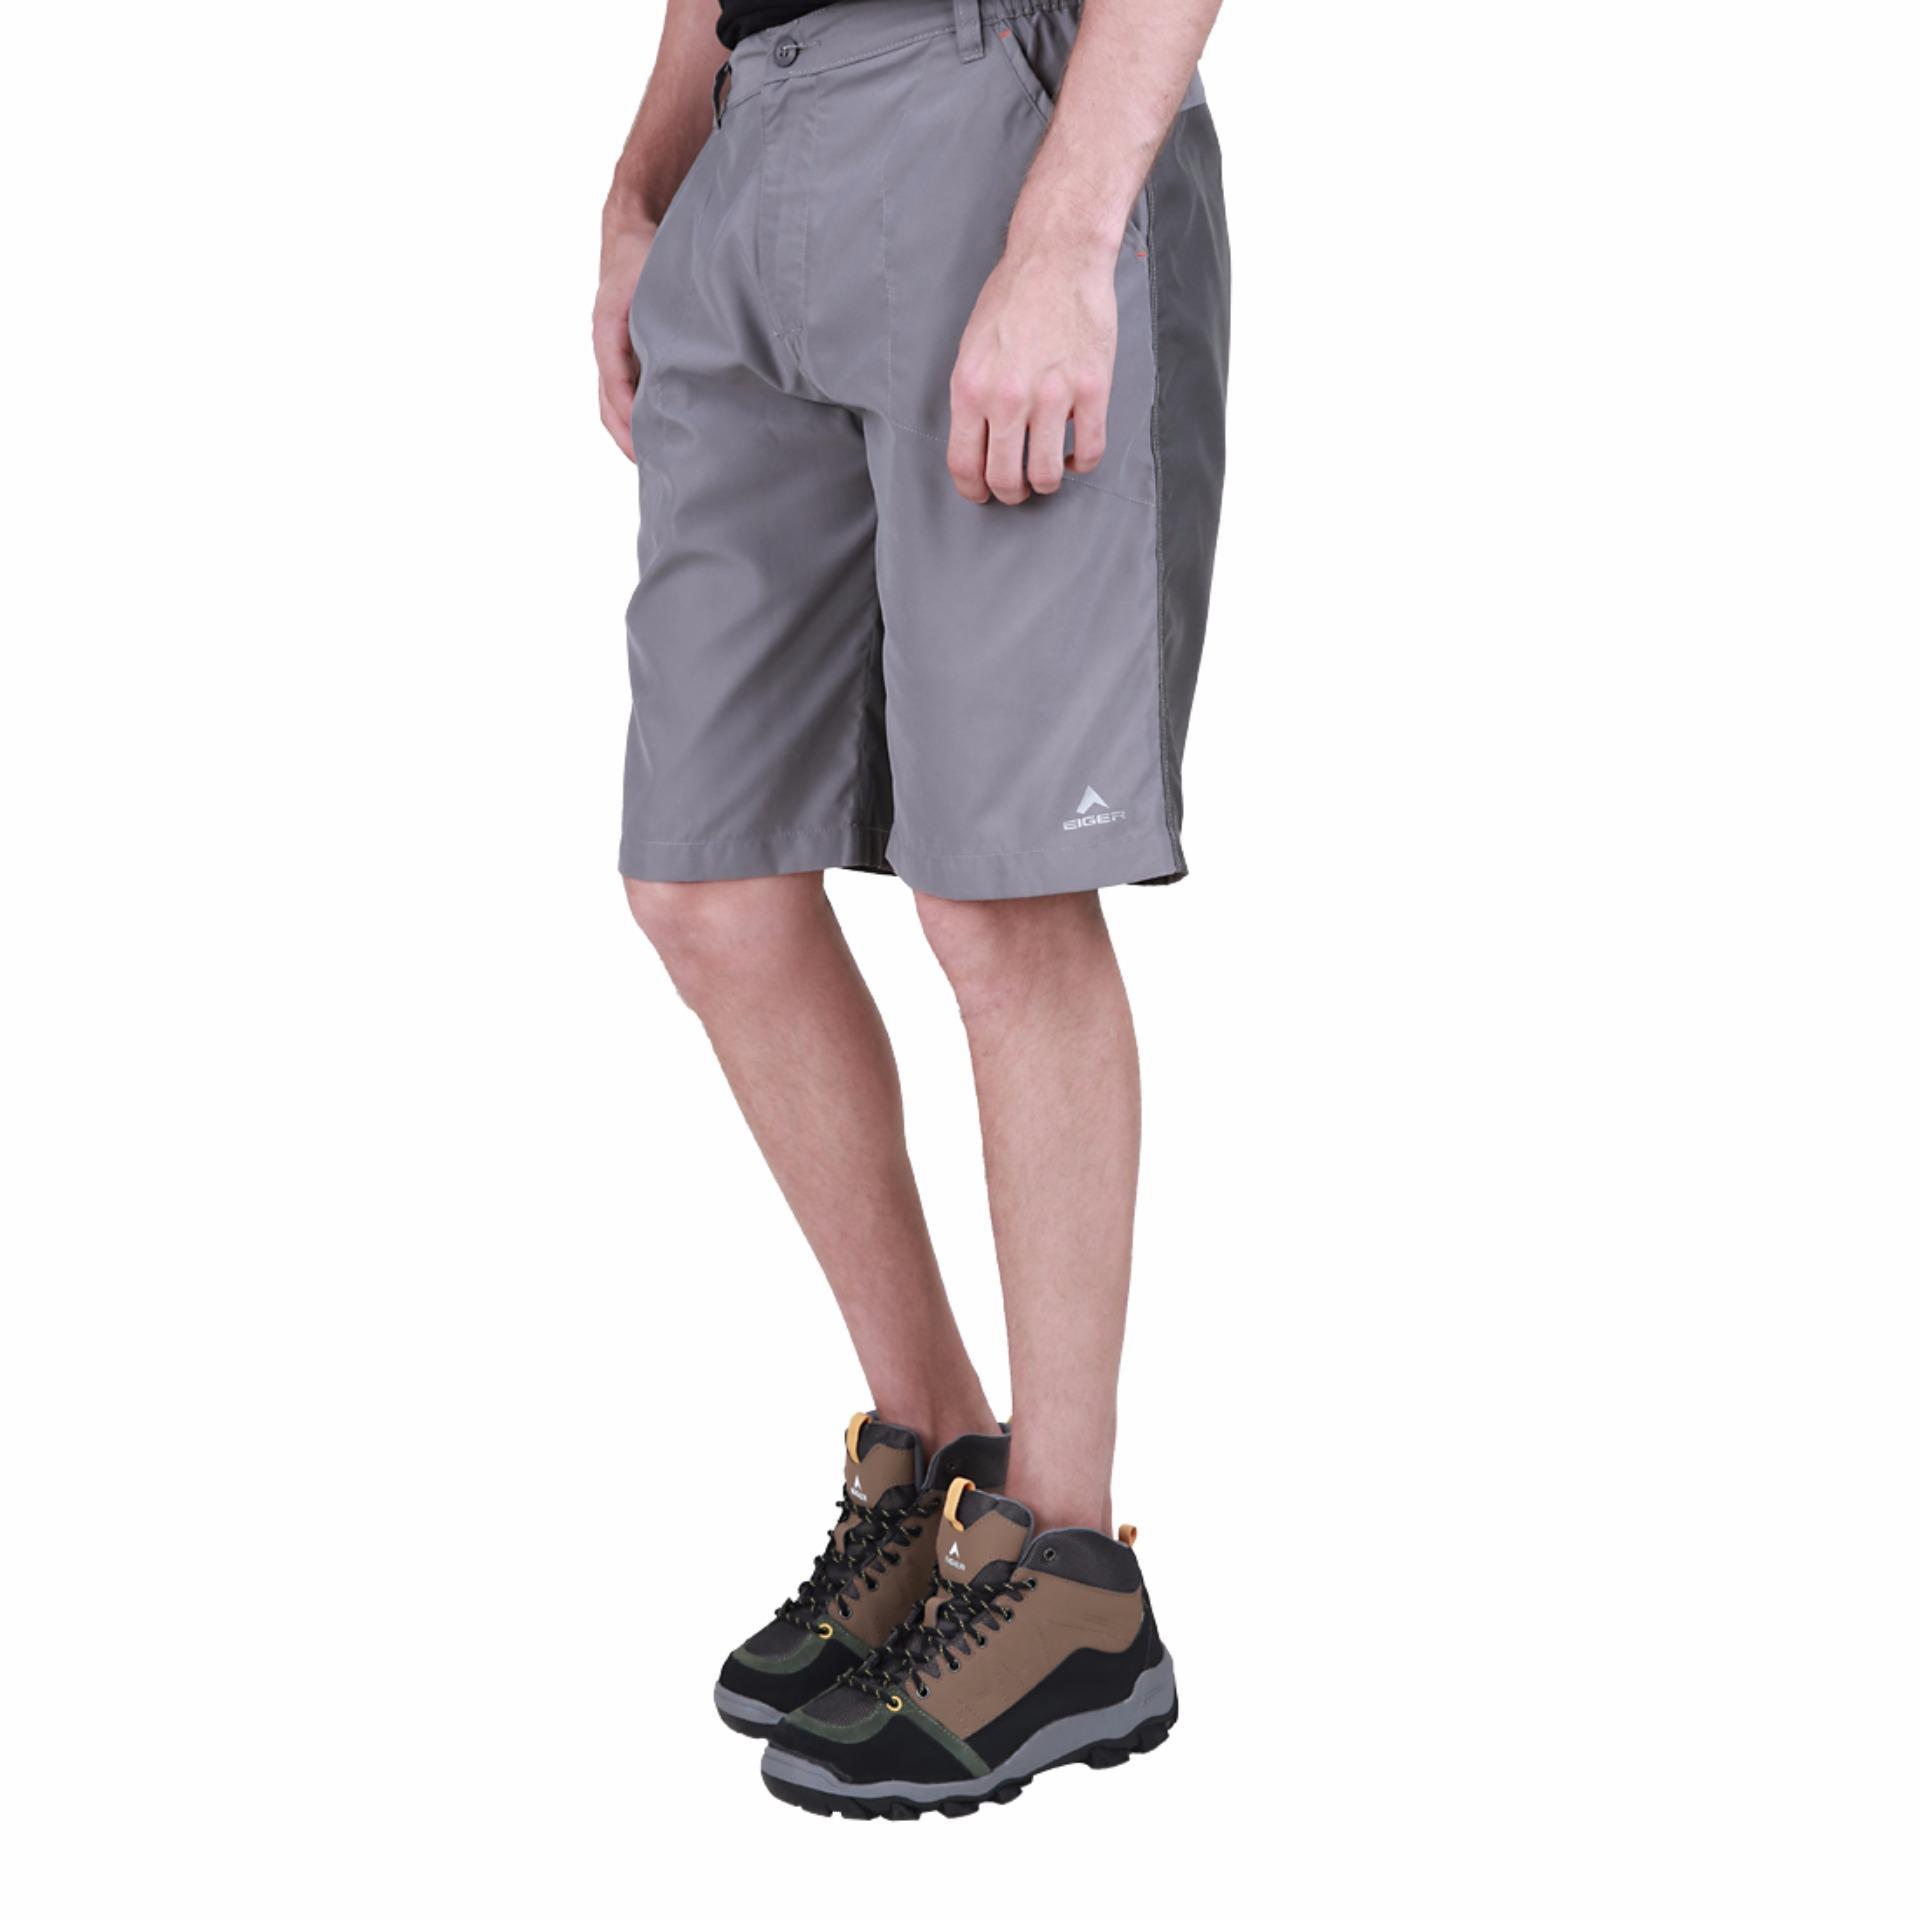 Eiger Celana Xdirt Short Mic Fiber Abu Review Daftar Harga Terbaru 1989 Thanatos Ol Pants Grey Pendek Pria 30 Horco Silver